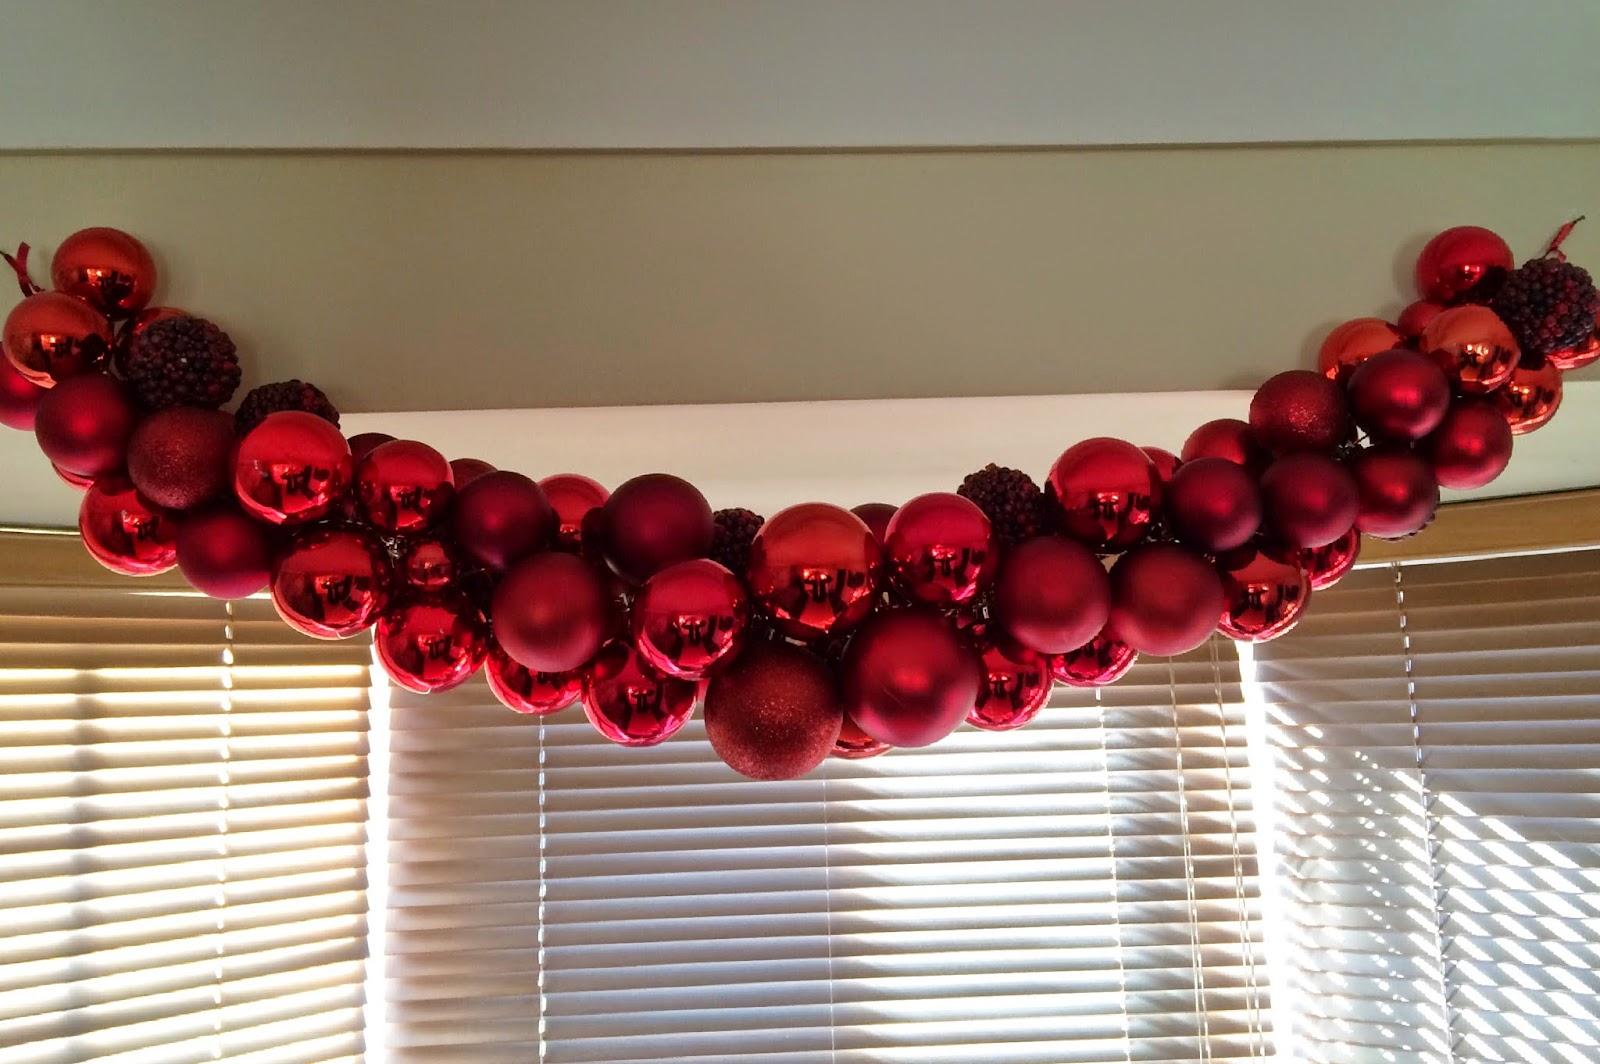 Christmas DIY crafting homemade decorations